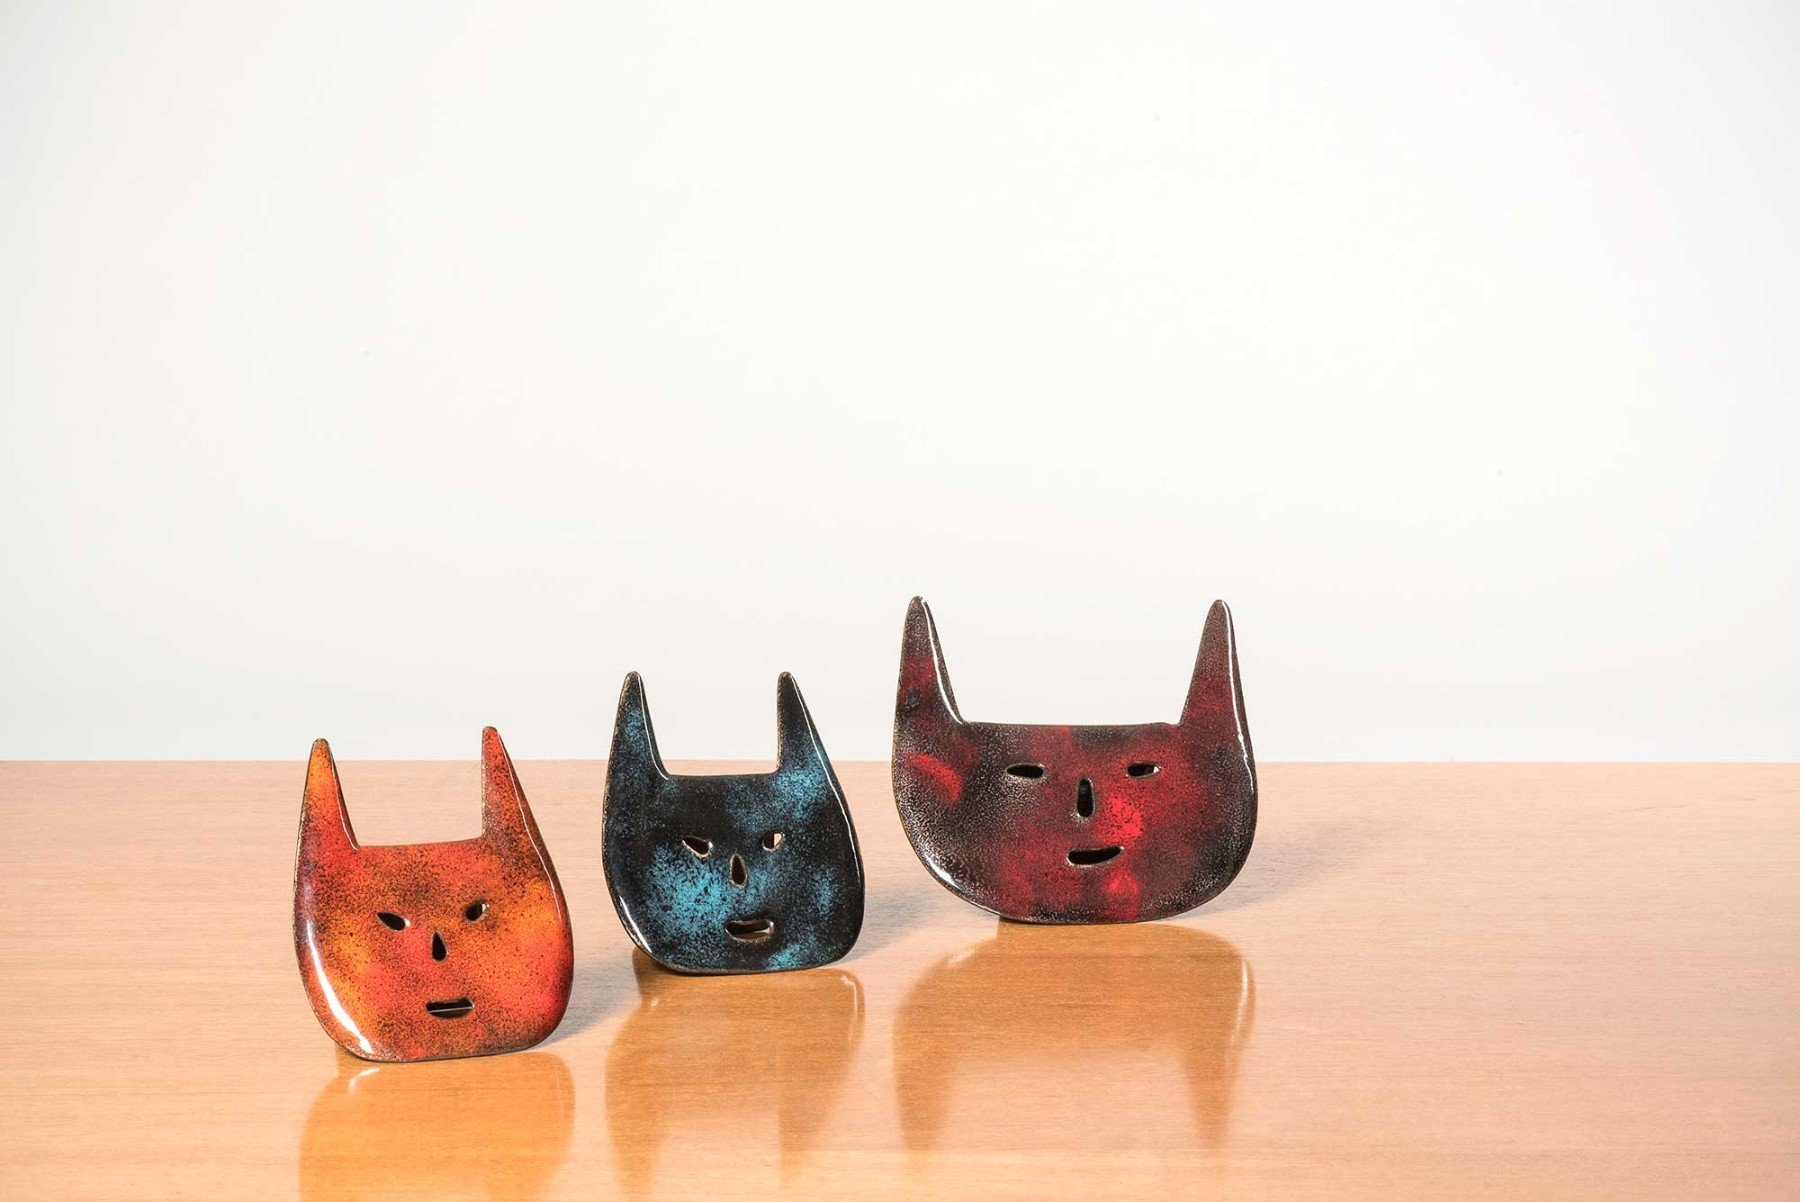 Gio Ponti     Diavolo - decorative objects